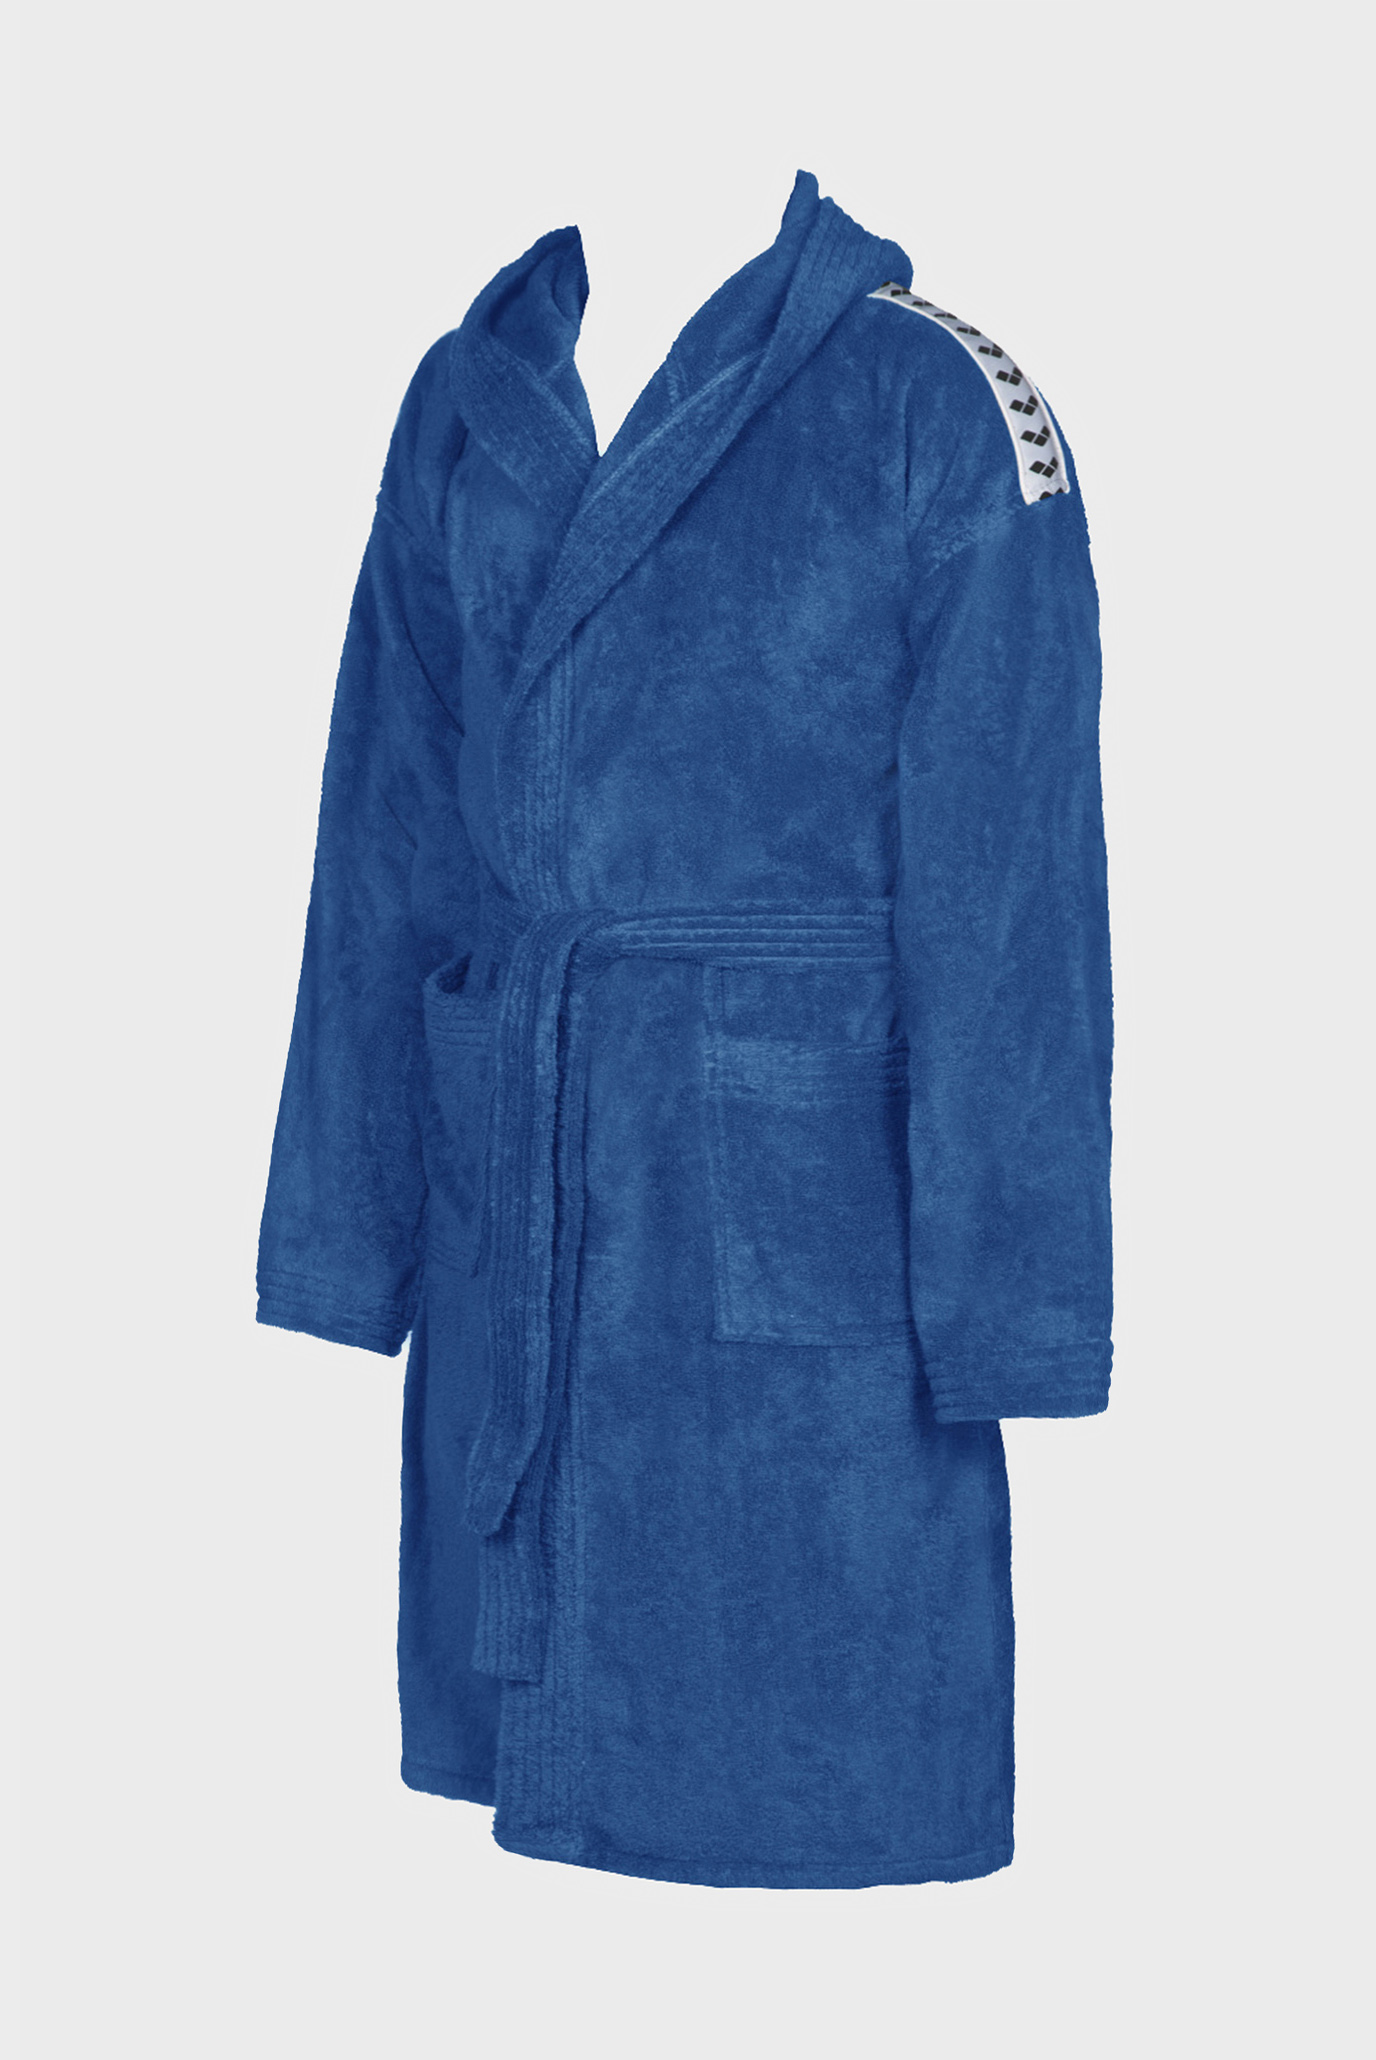 Дитячий синій халат CORE SOFT 1